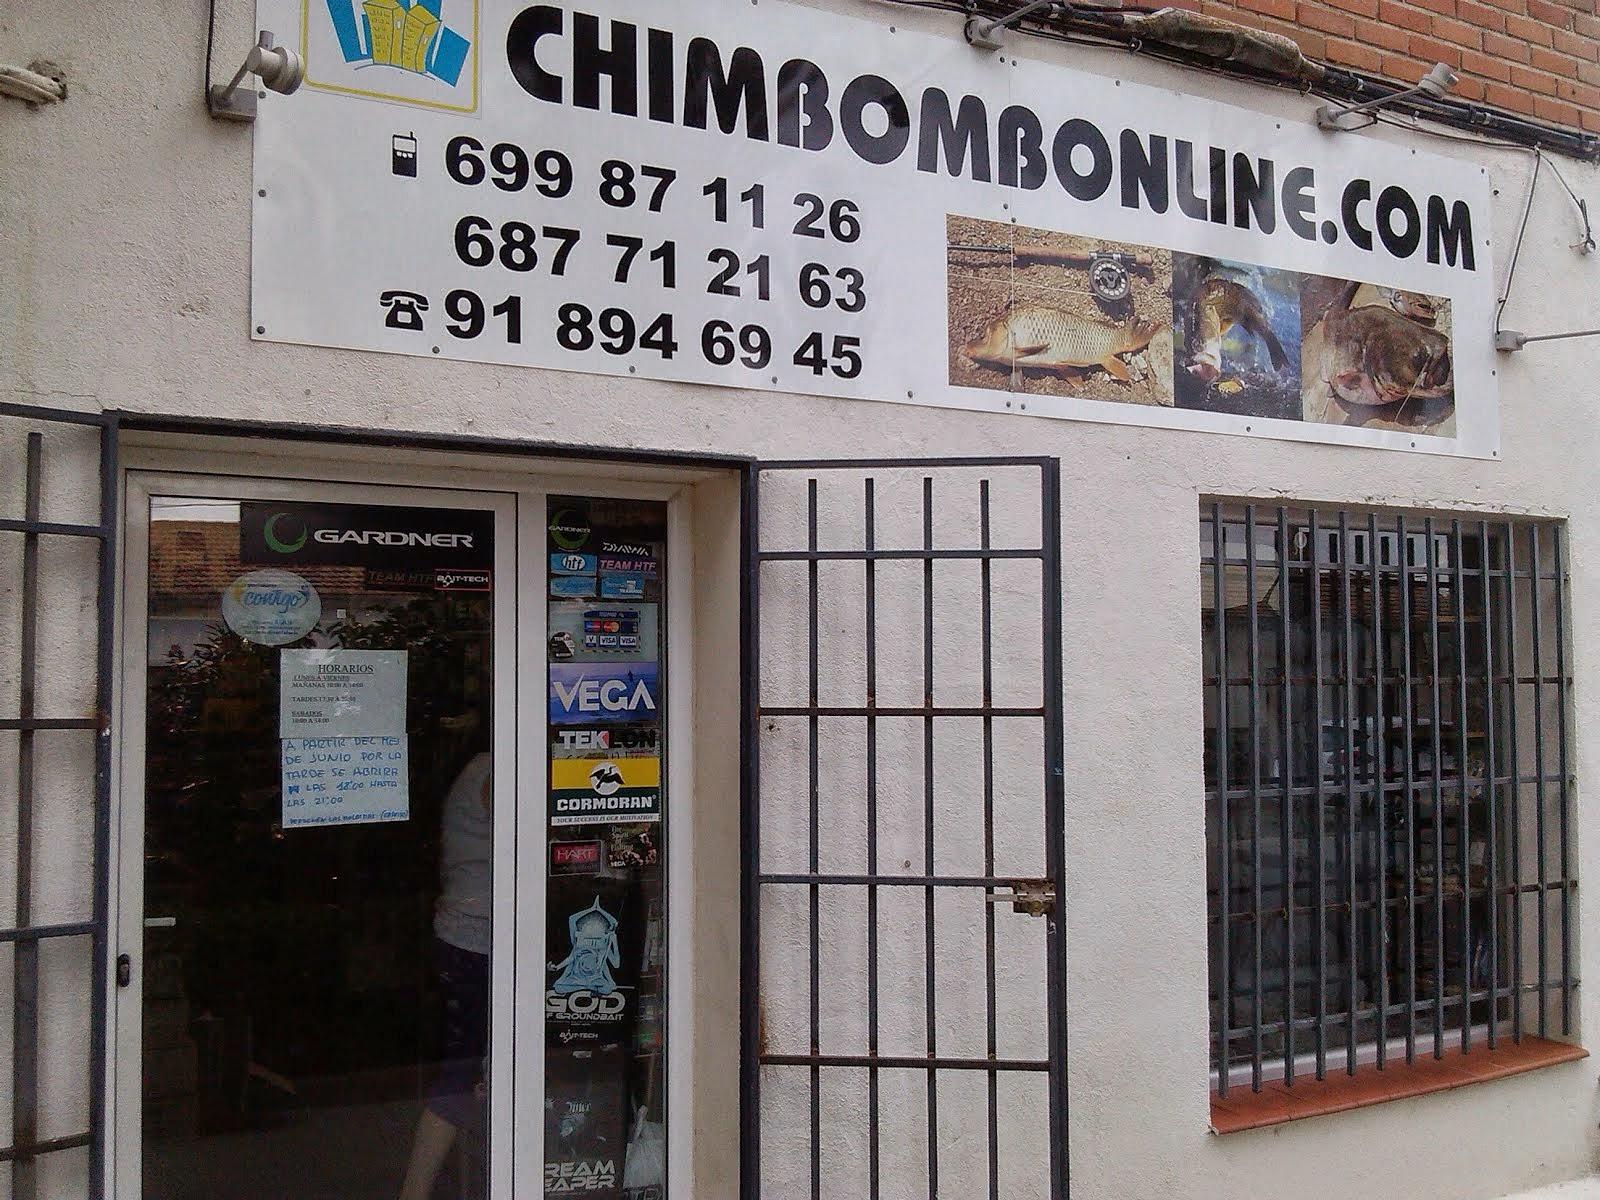 CHIMBOMBO